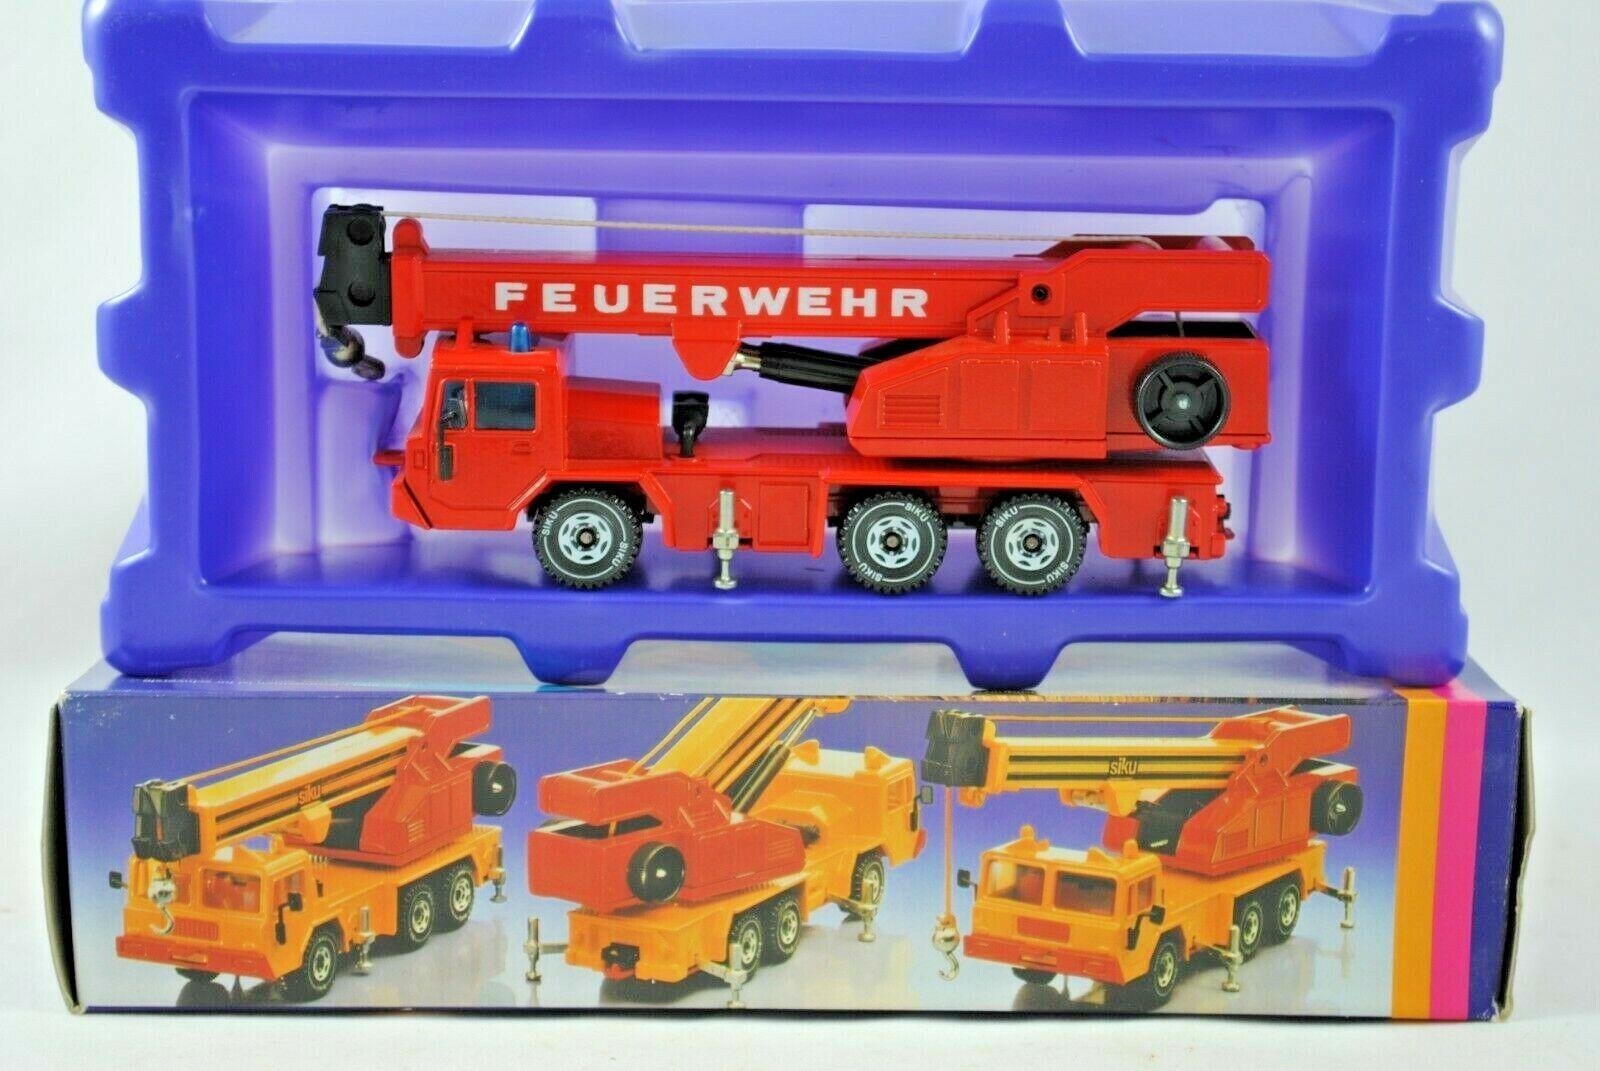 SIKU 2914 FAUN 3-Axle MOBILE CRANE w Siku Wheels in FEUERWEHR Livery MIB